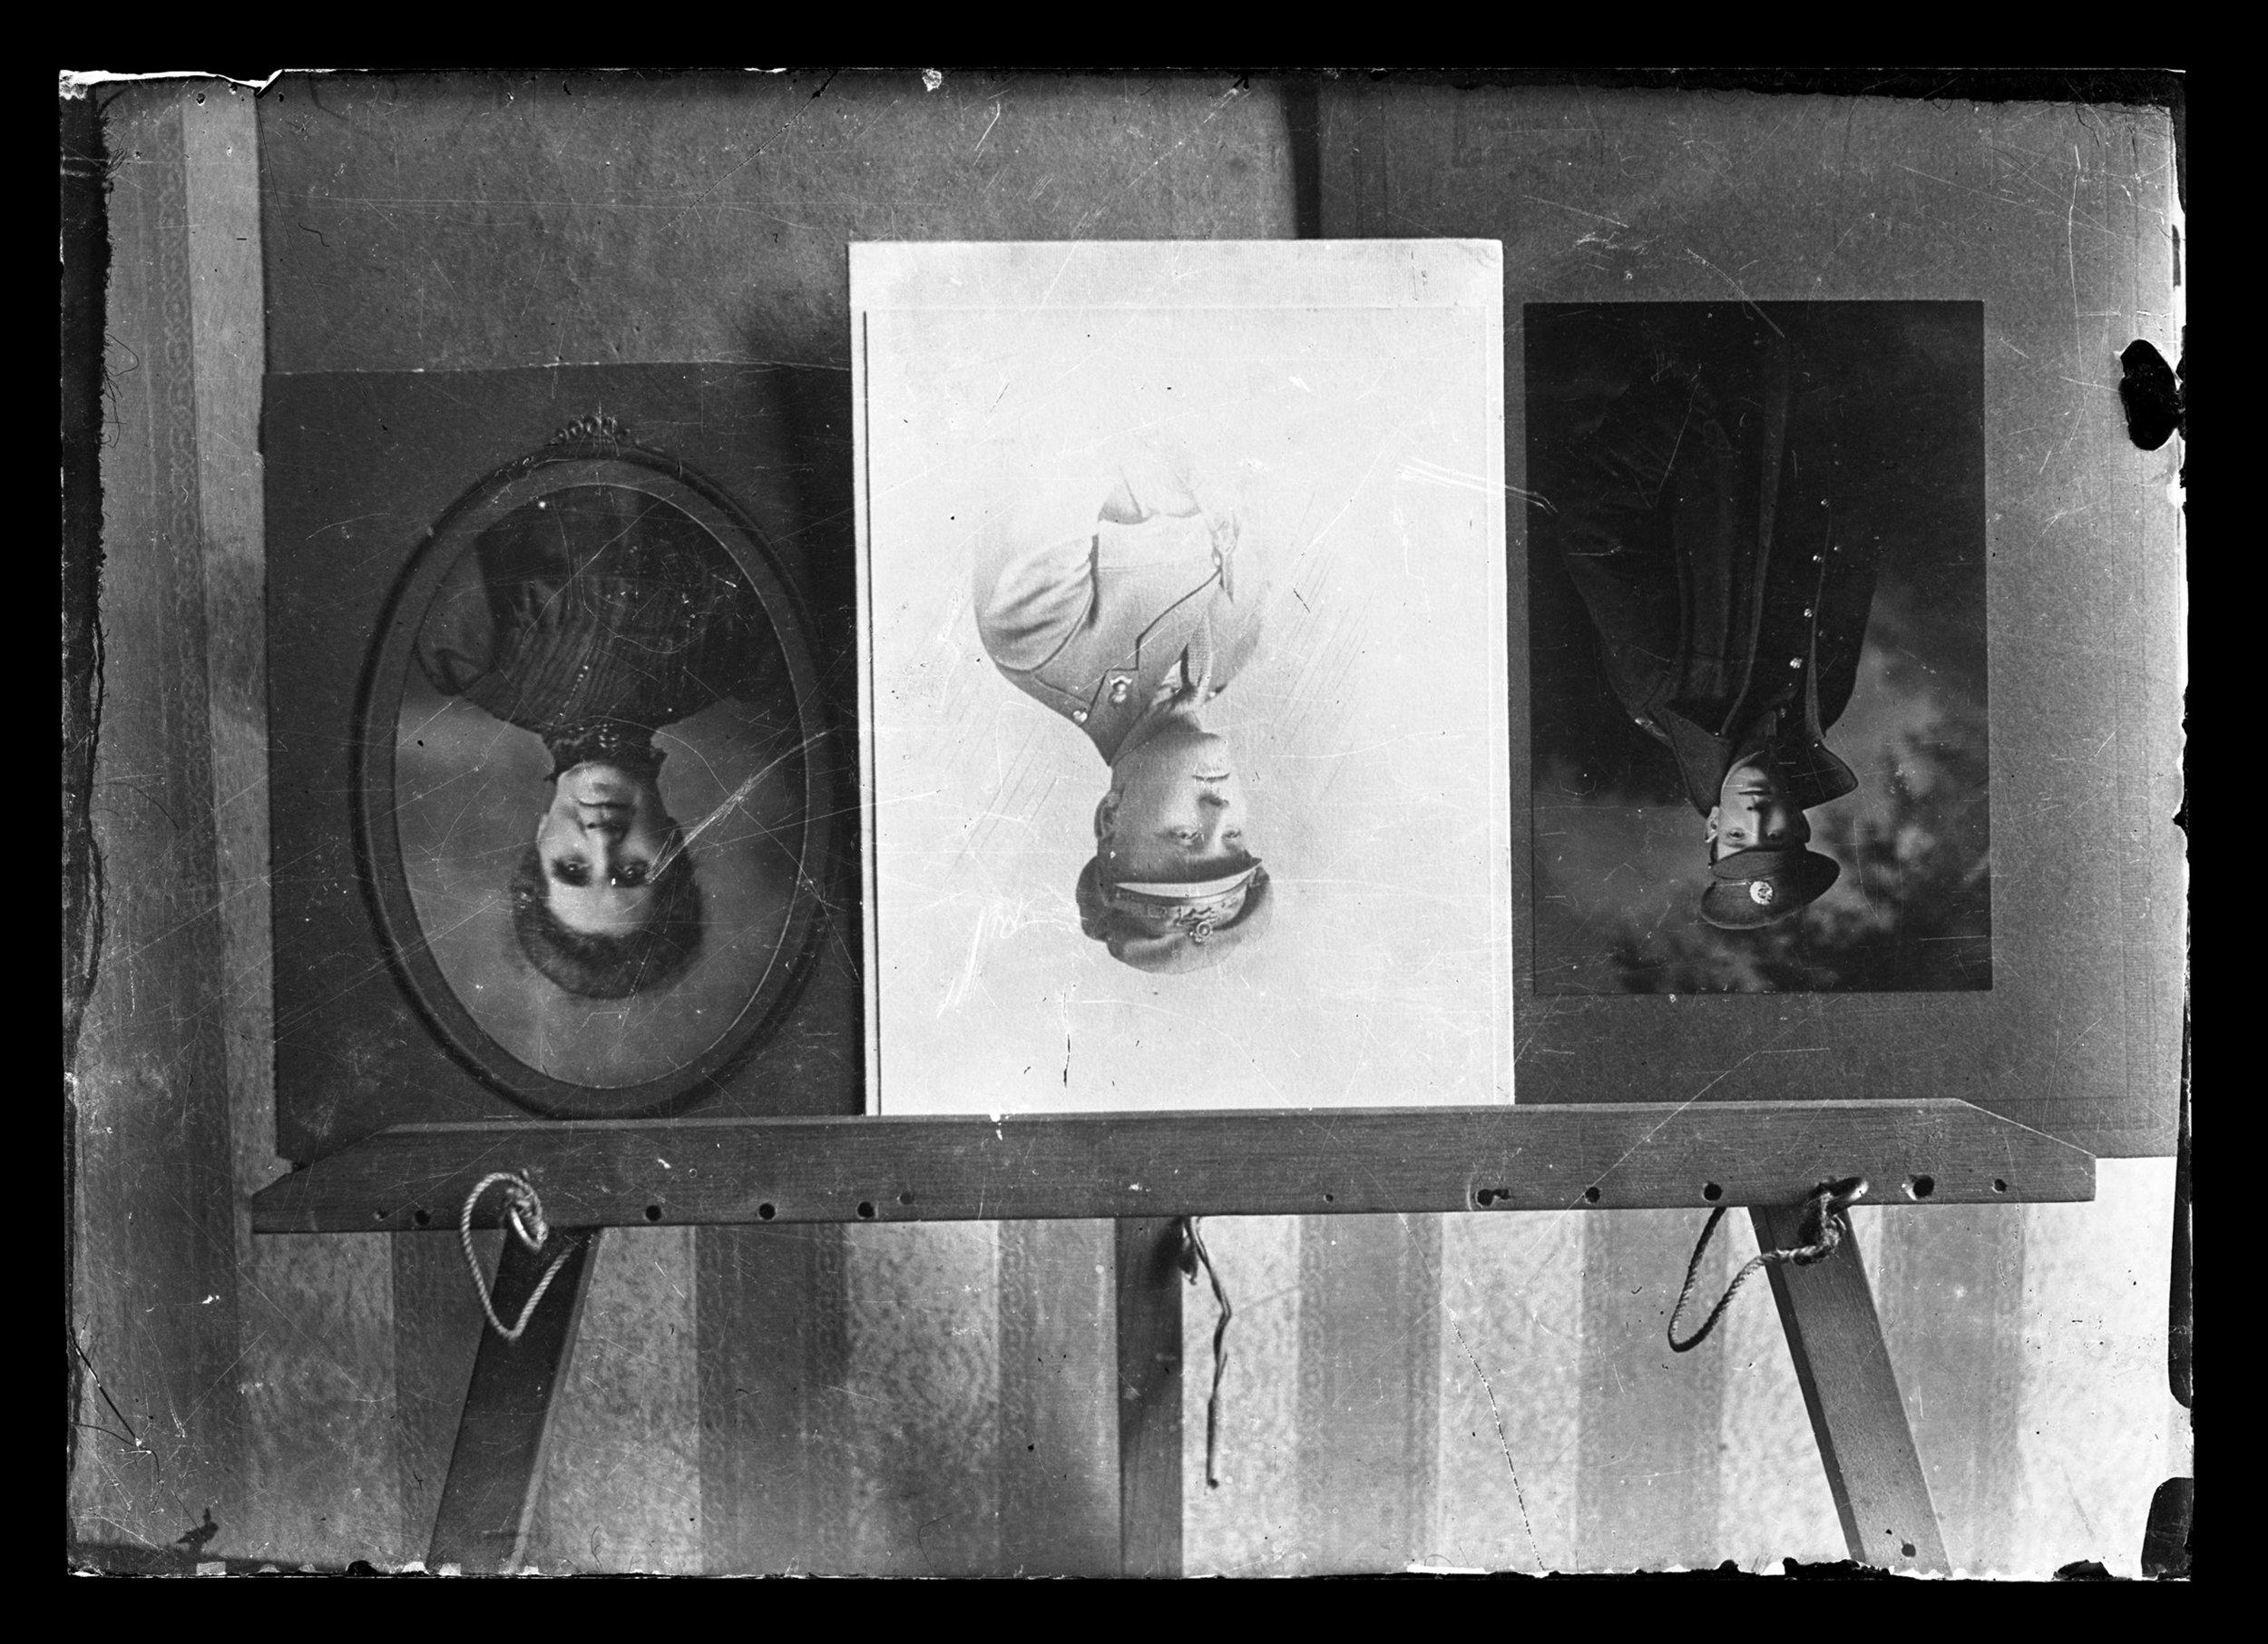 berwick-photographic-recording-digitsation-scanning-negative-transparancies-edinburgh-newcastle-service-photography-glass-plate-darkroom.jpg